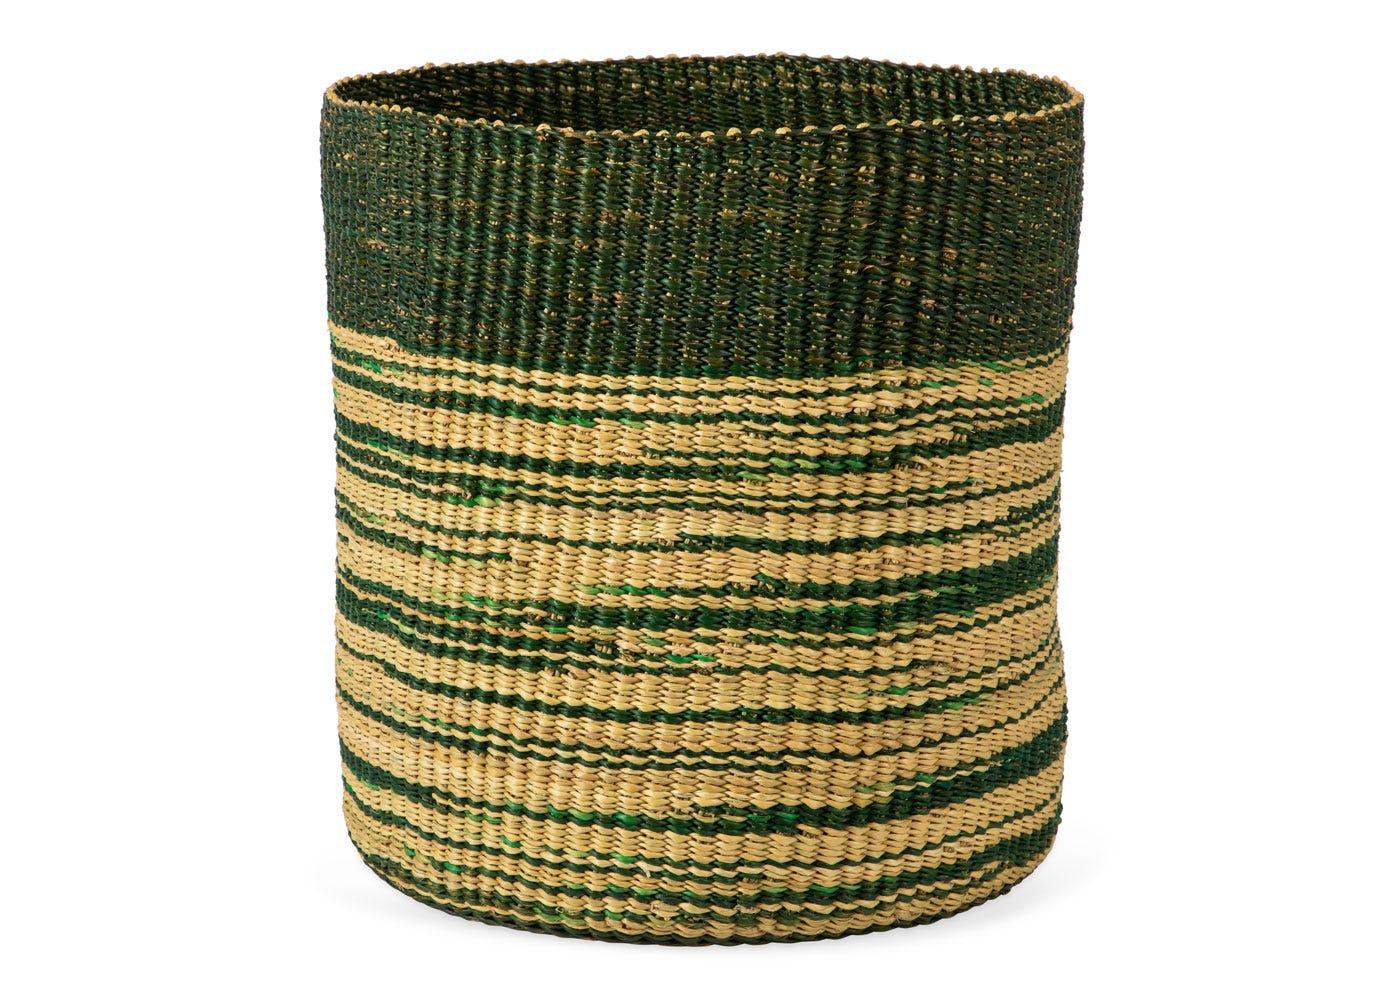 As Shown: Handwoven Storage Basket in Green